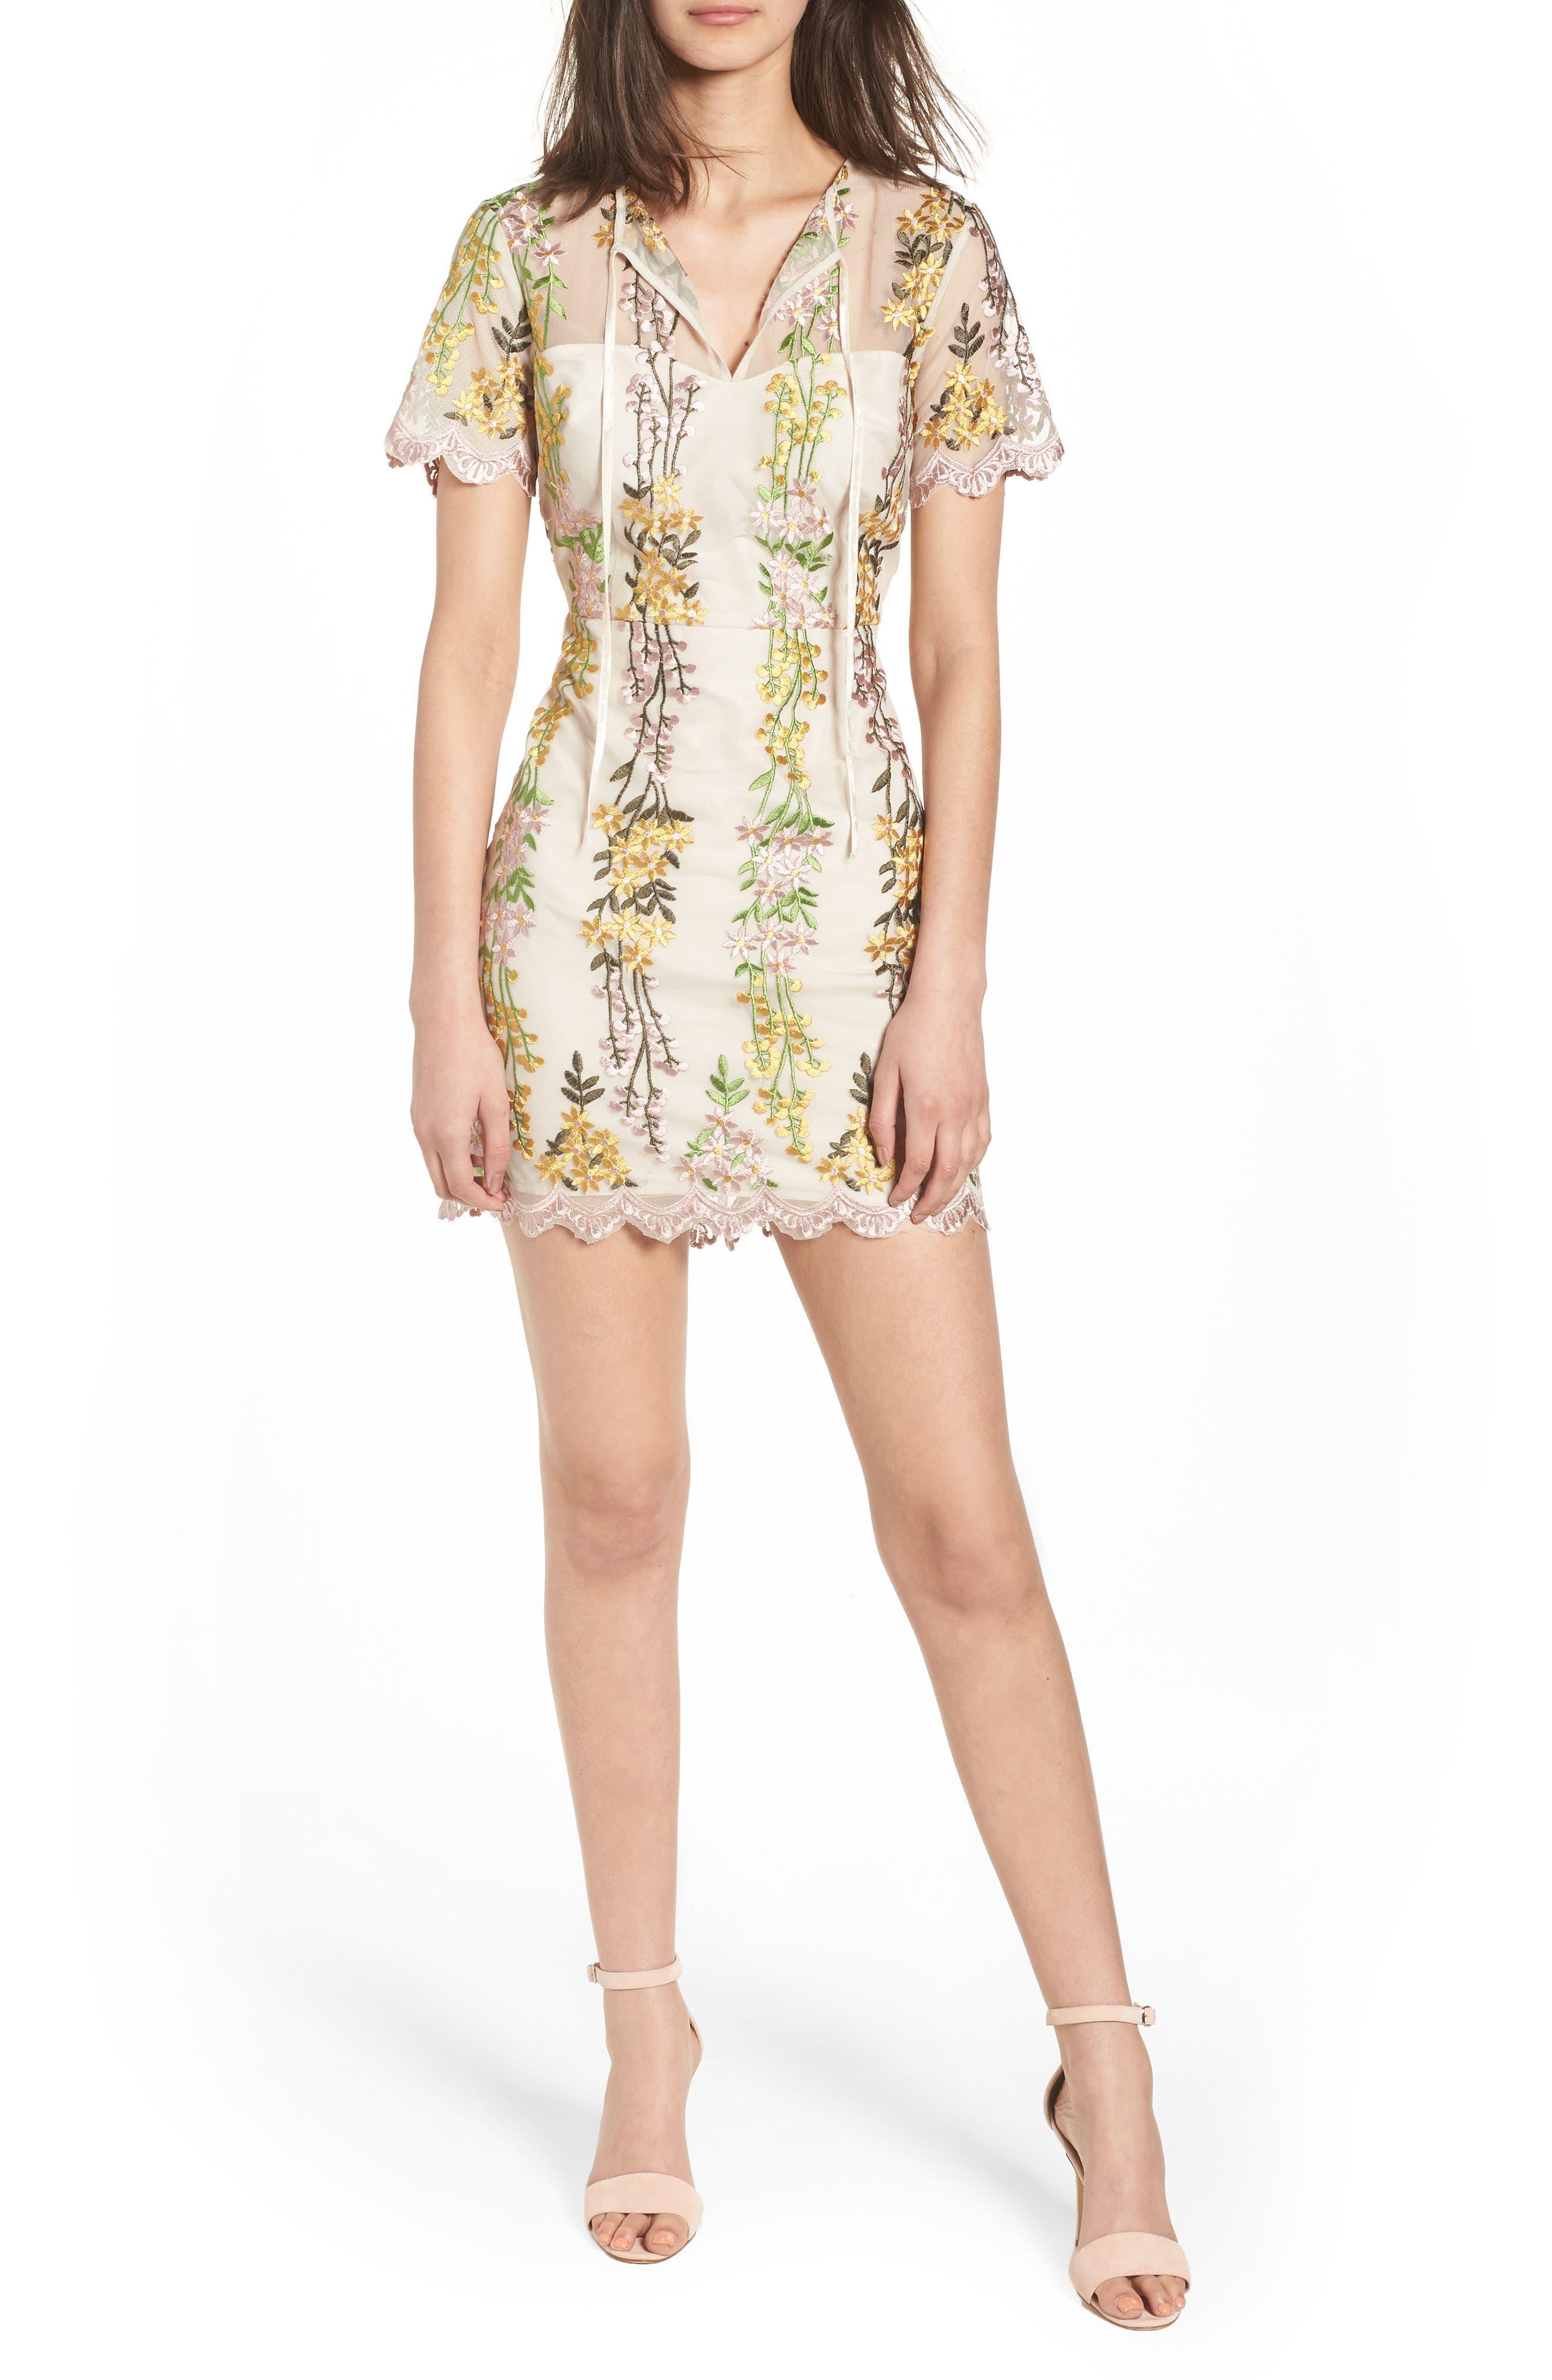 Gram Embroidered Minidress,                         Main,                         color, Soft Beige